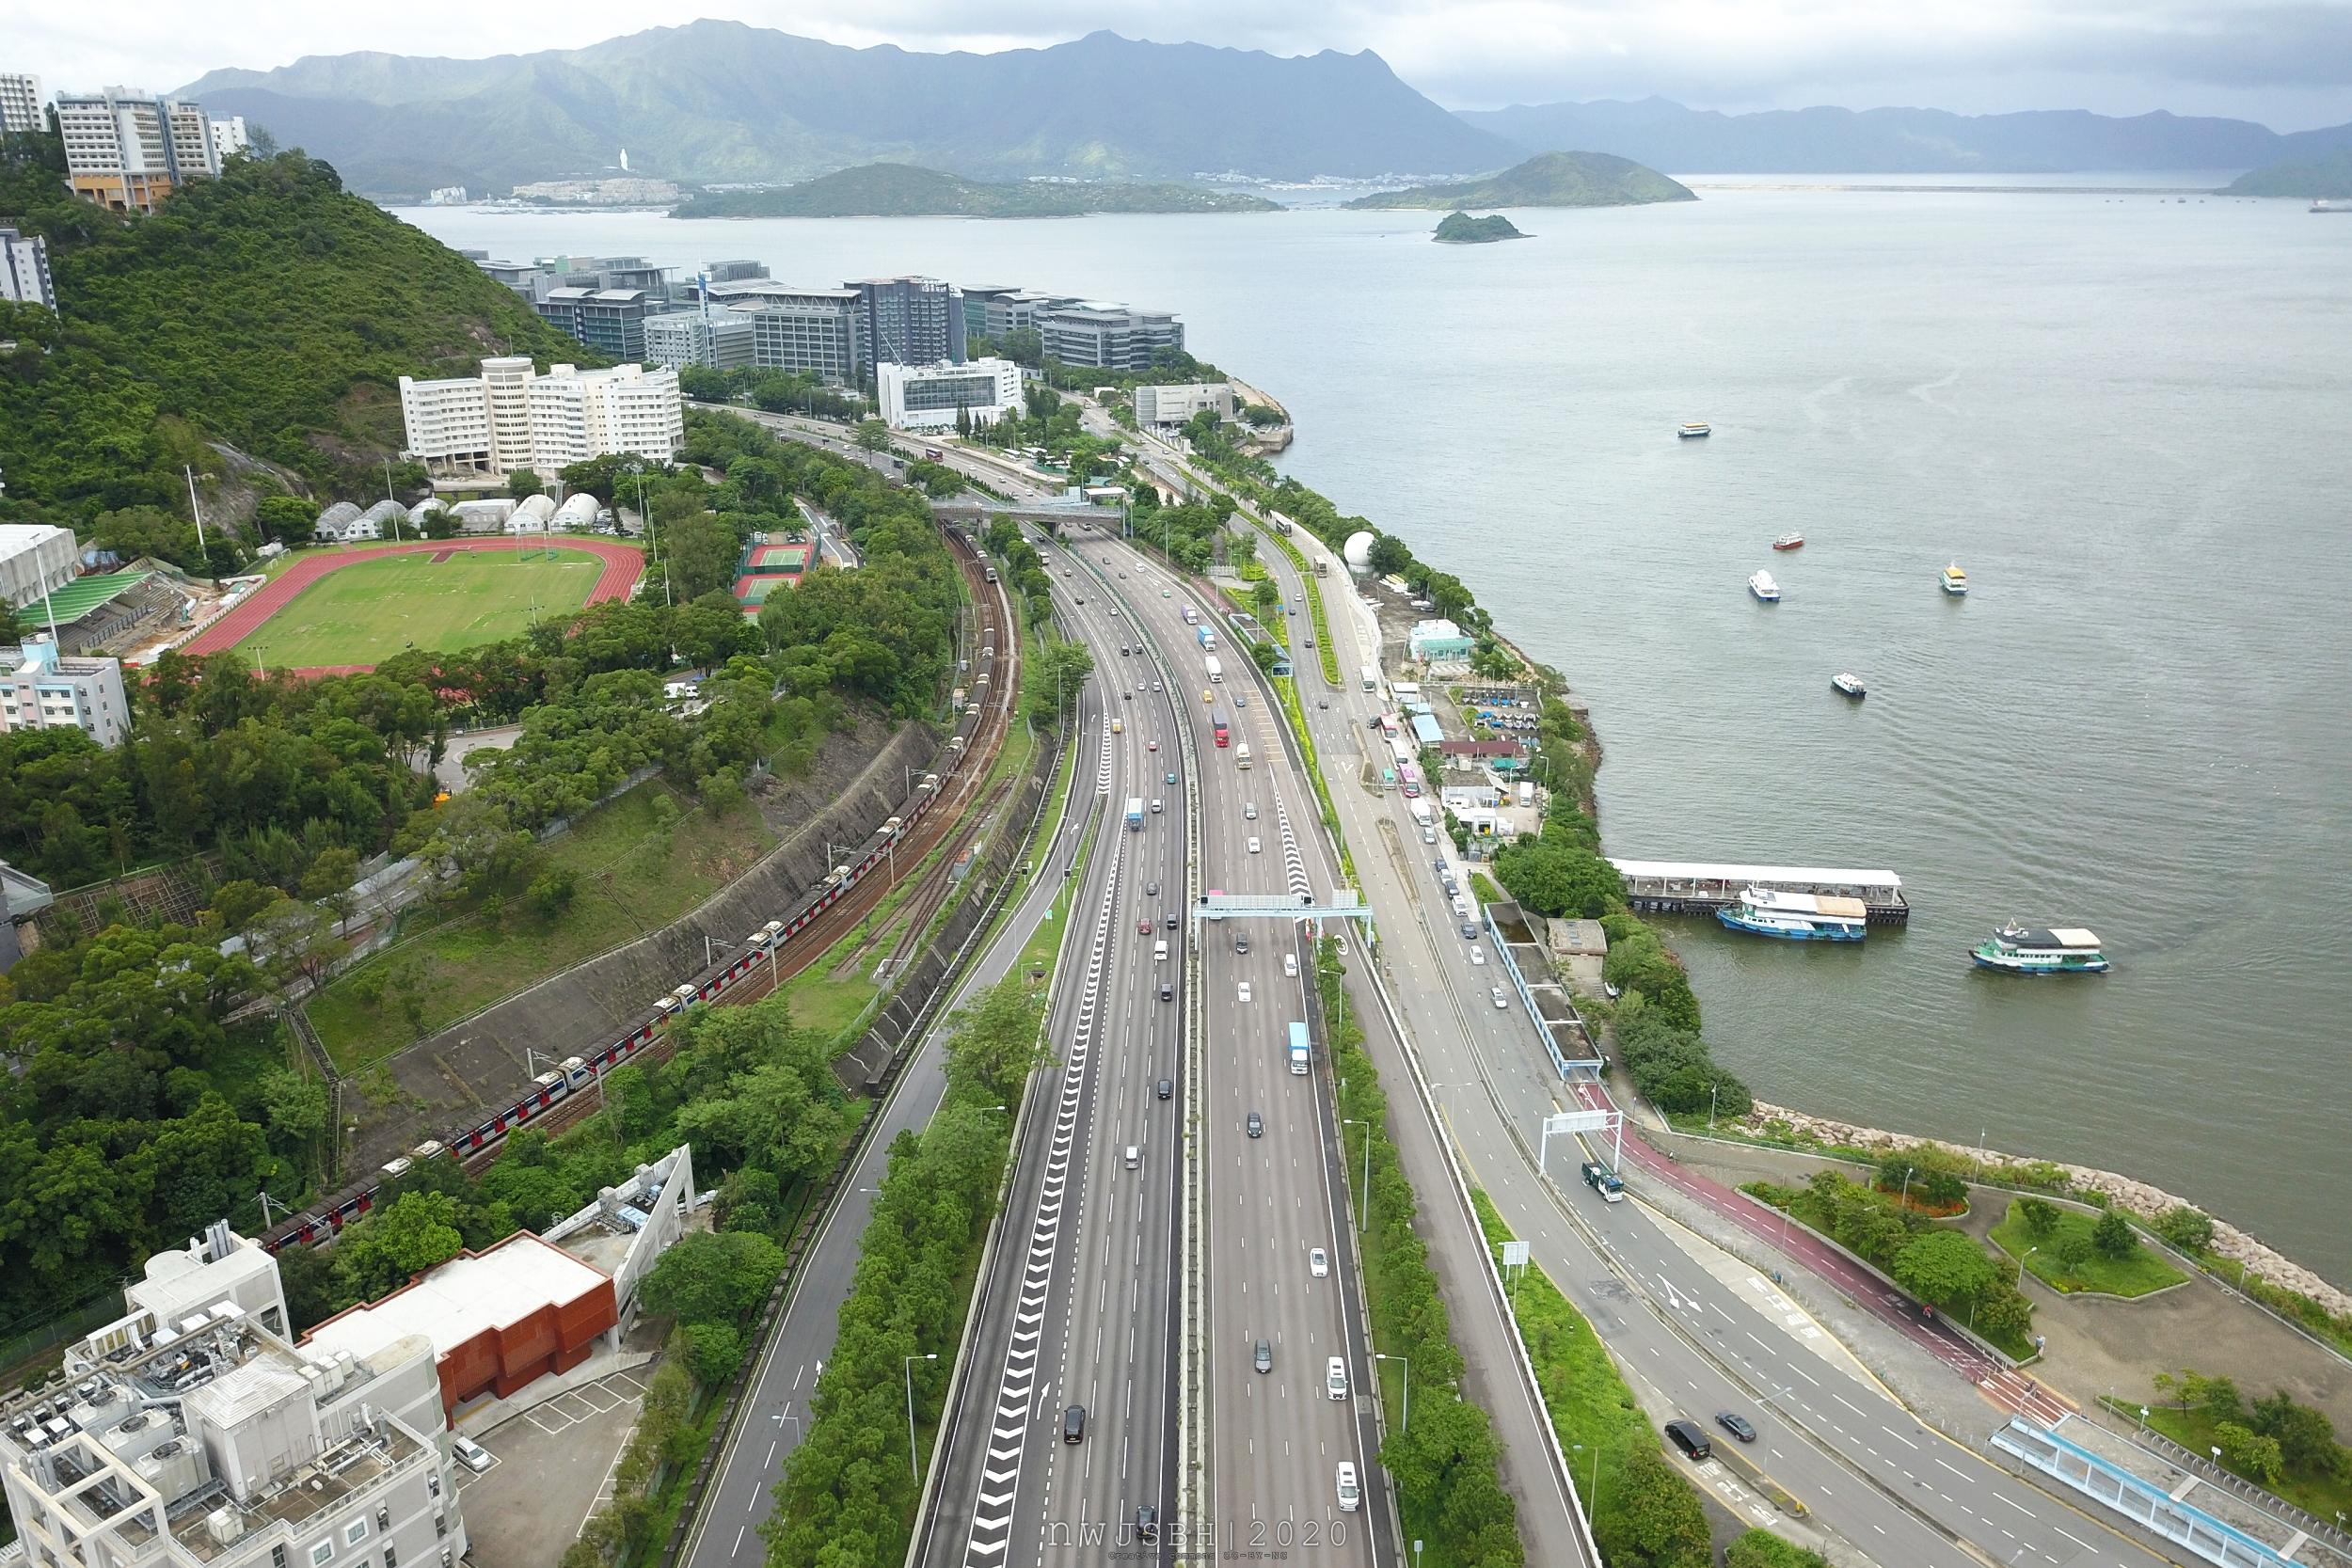 吐露港公路